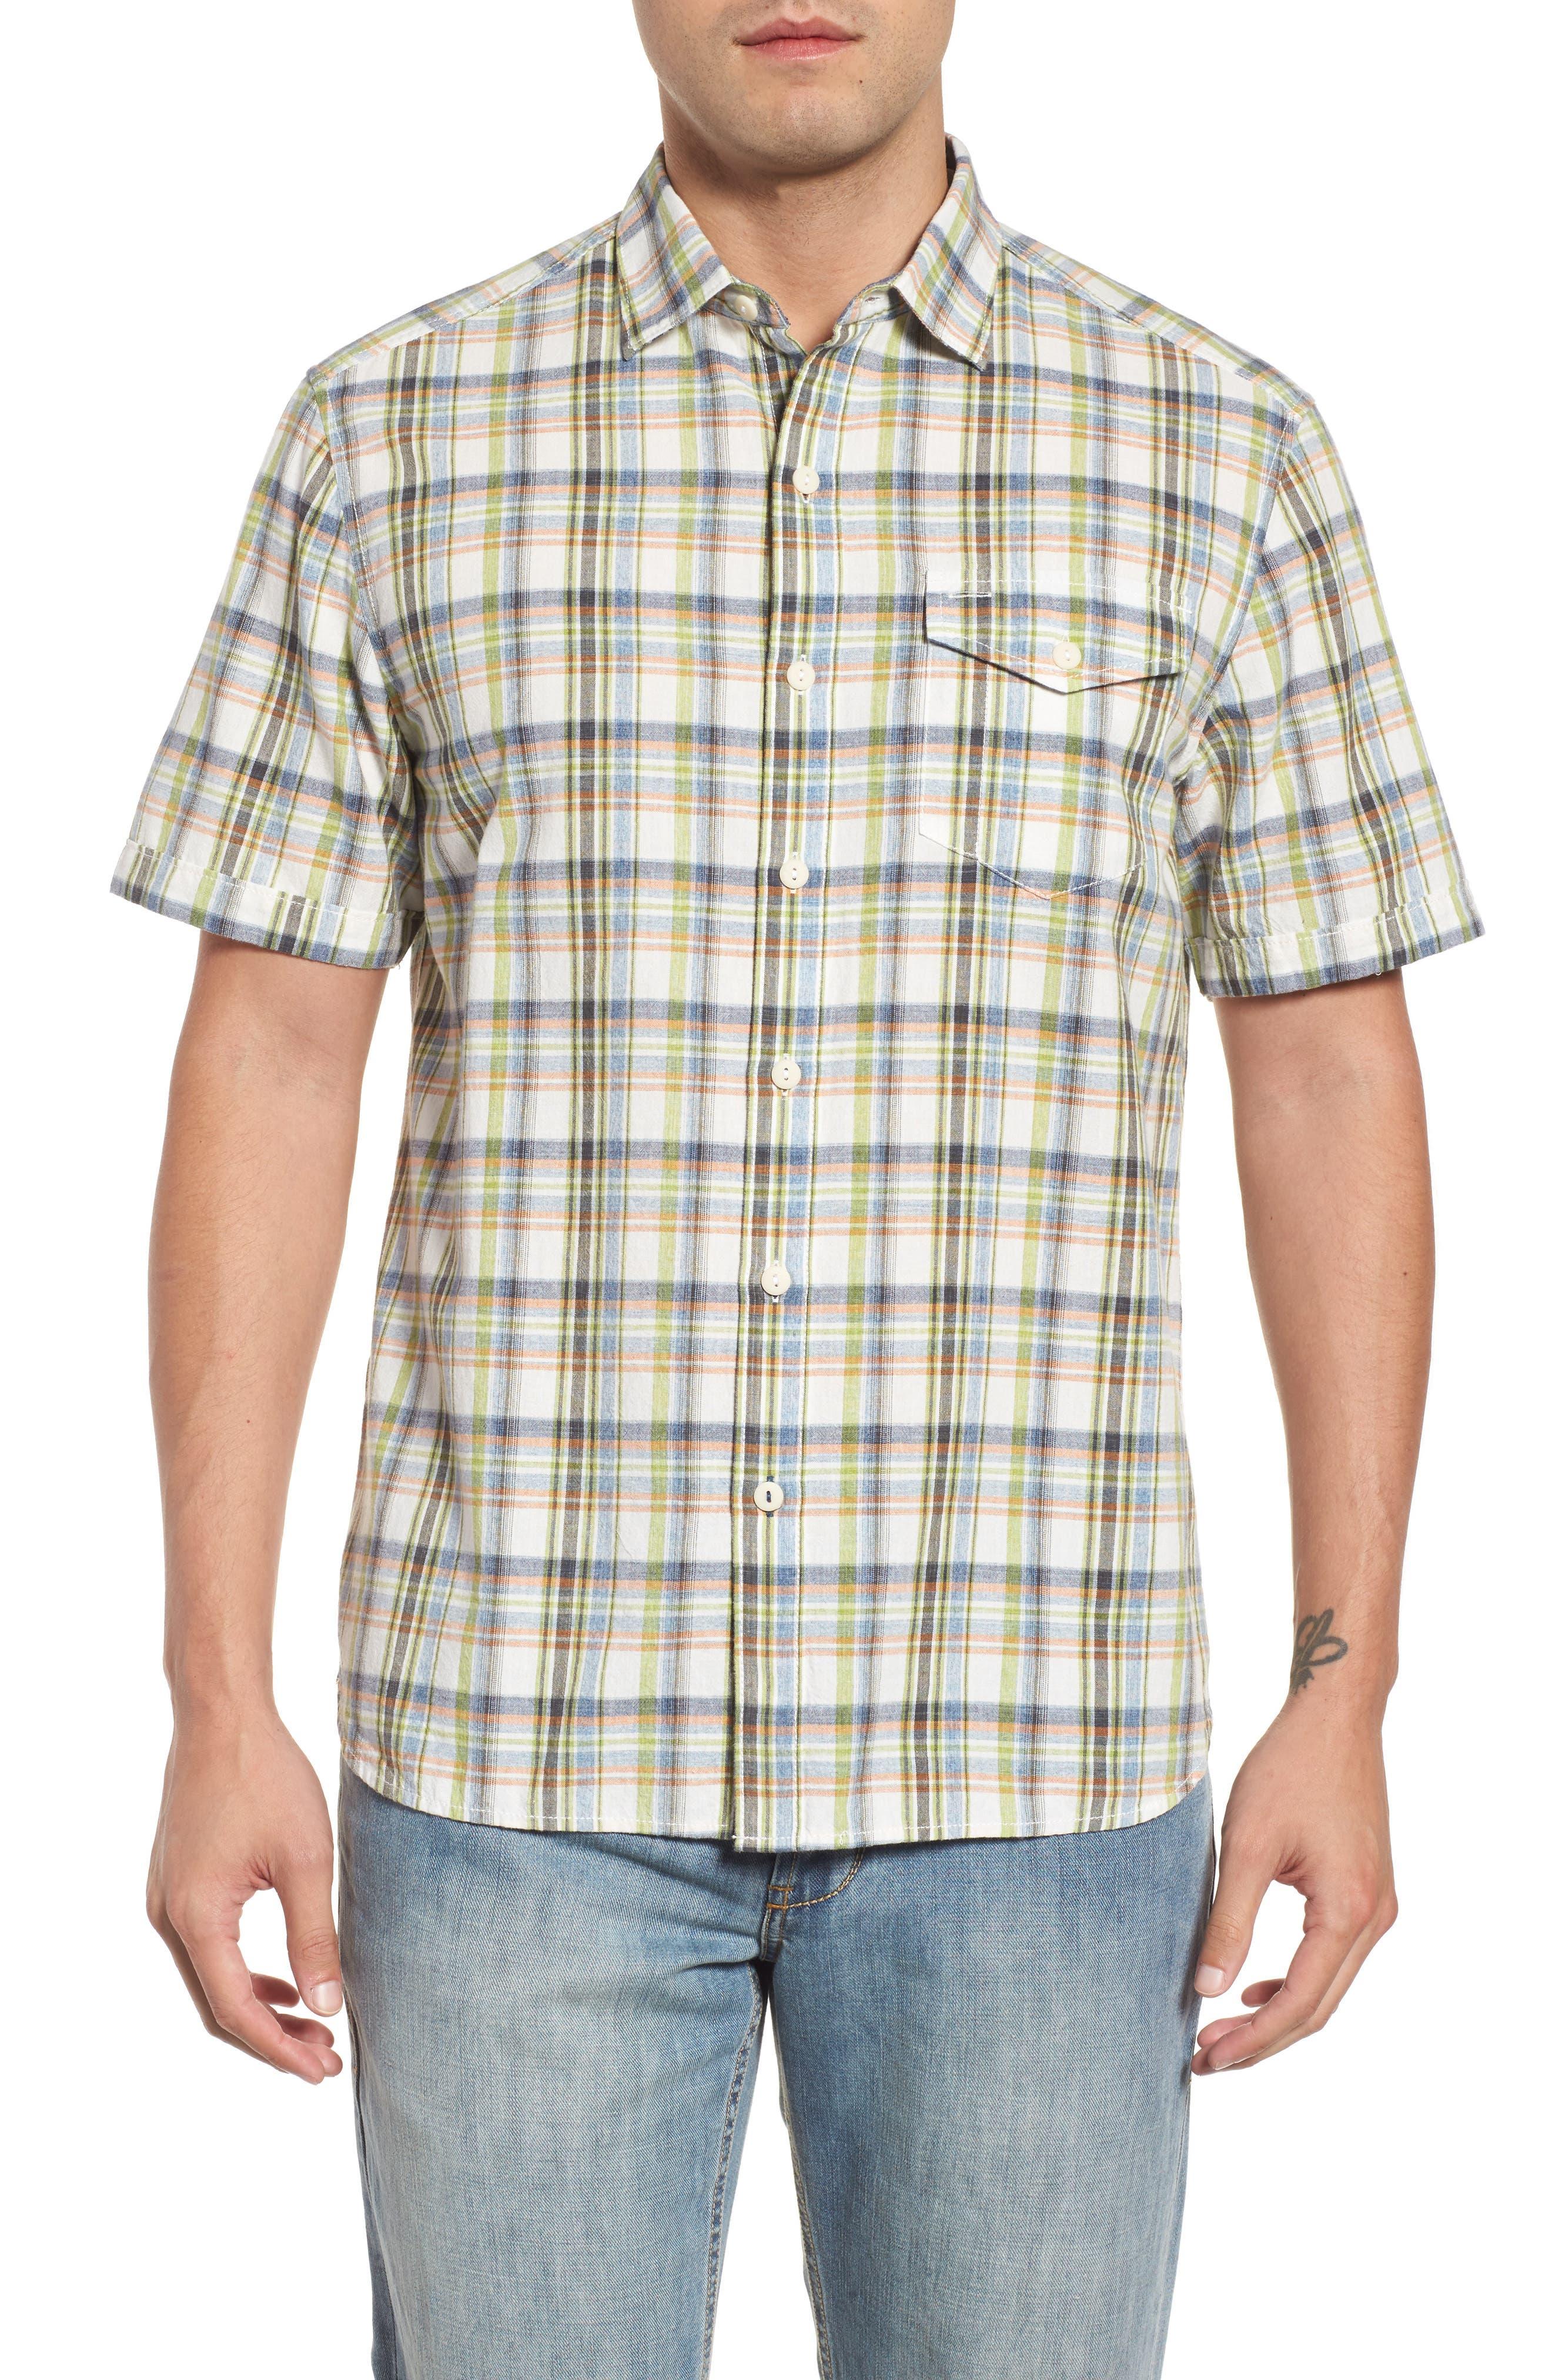 Ocean Cay Plaid Sport Shirt,                             Main thumbnail 1, color,                             Tart Apple